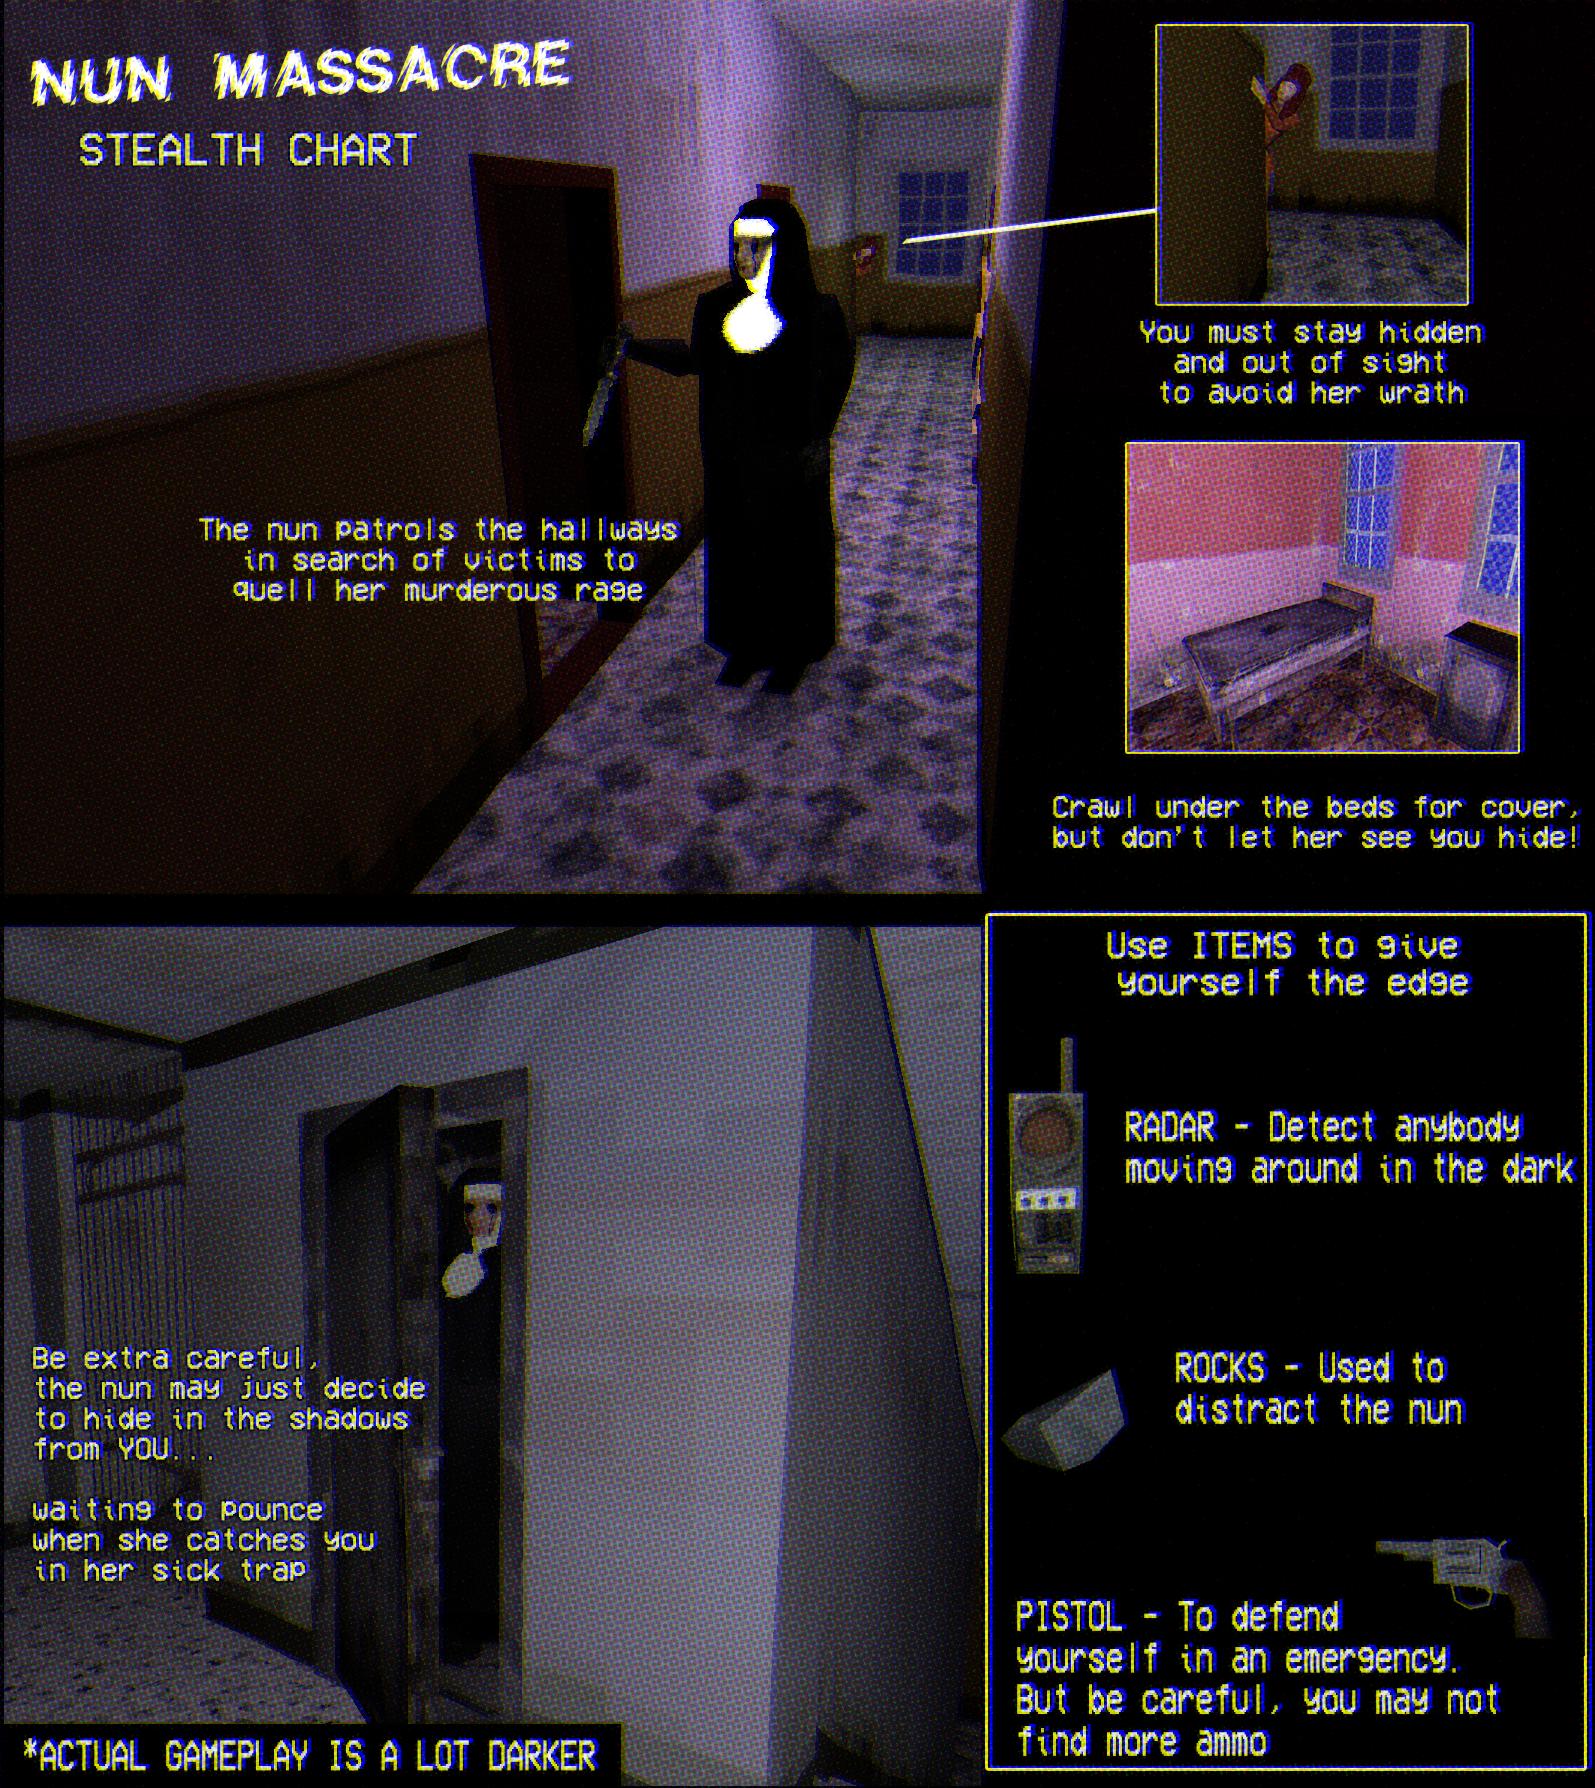 Nun Massacre   Puppet Combo Wiki   FANDOM powered by Wikia